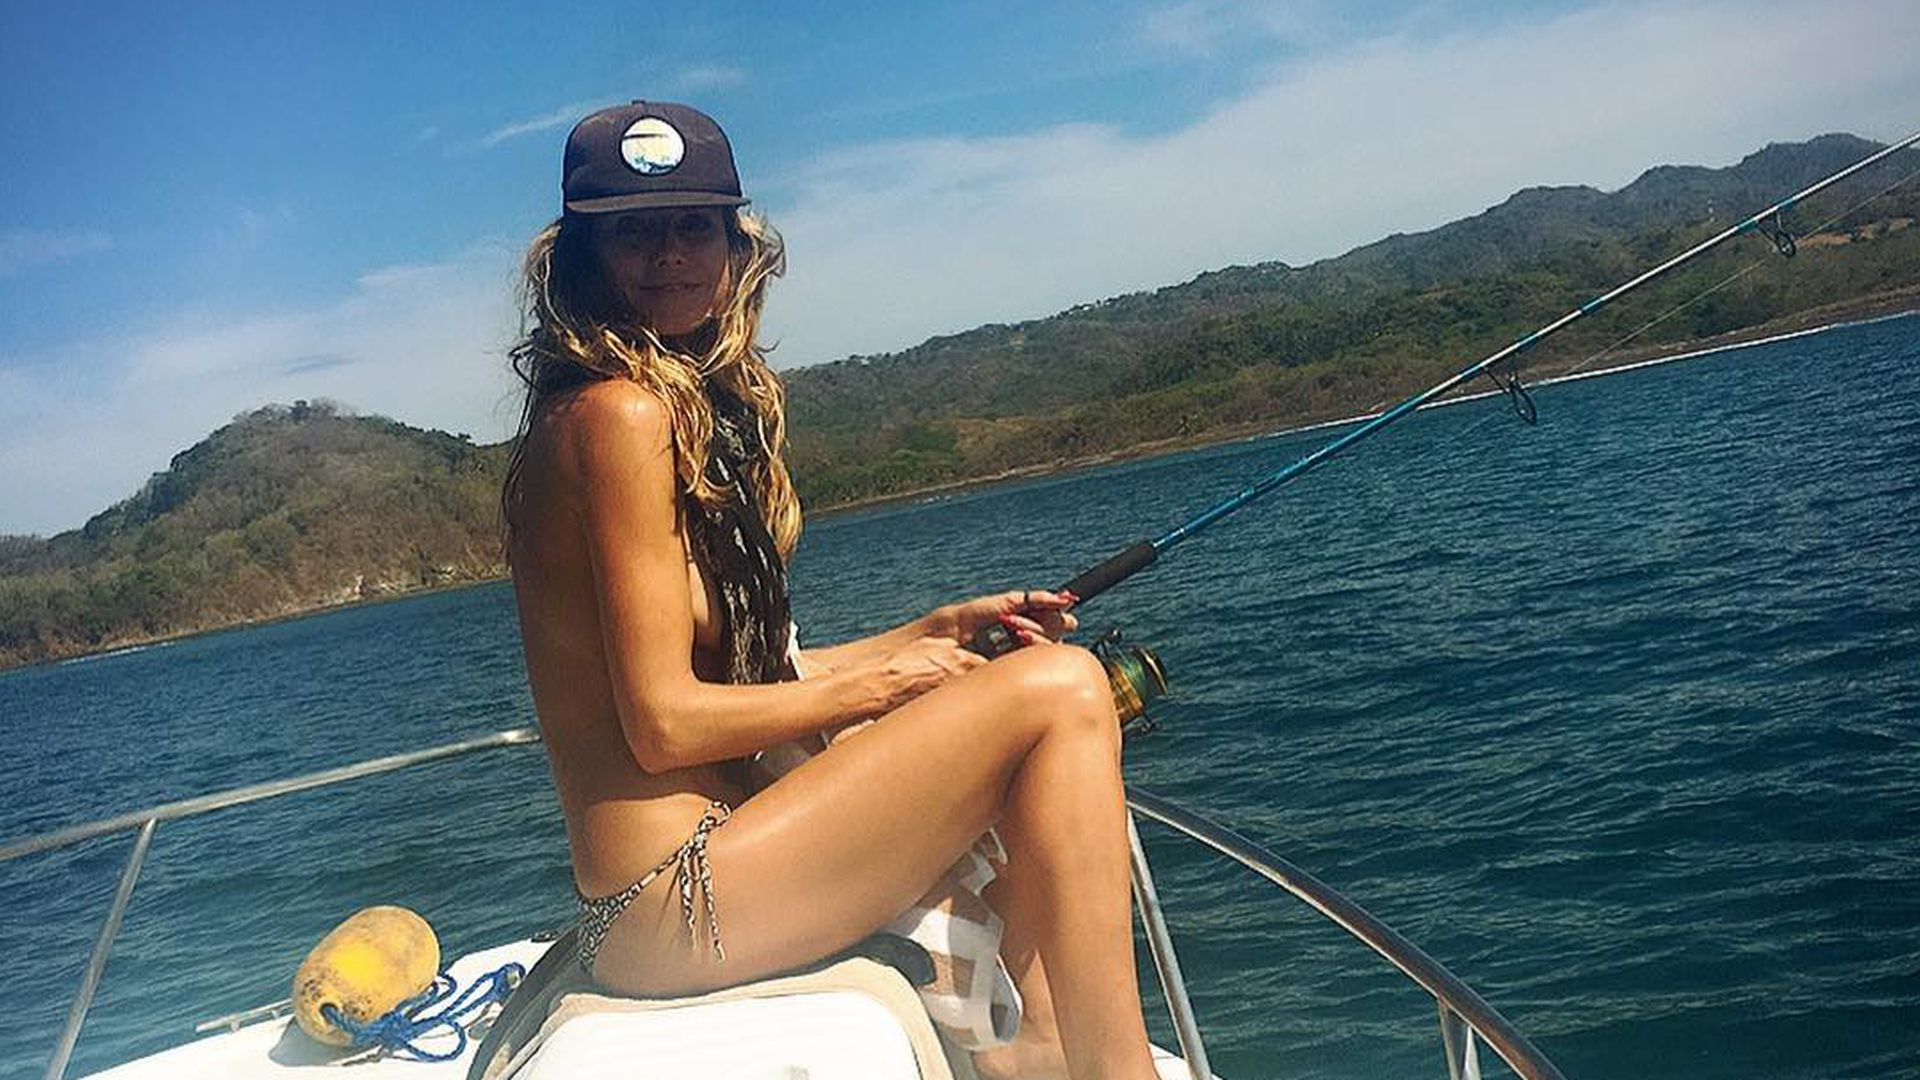 Boot nackt nackt oben ohne